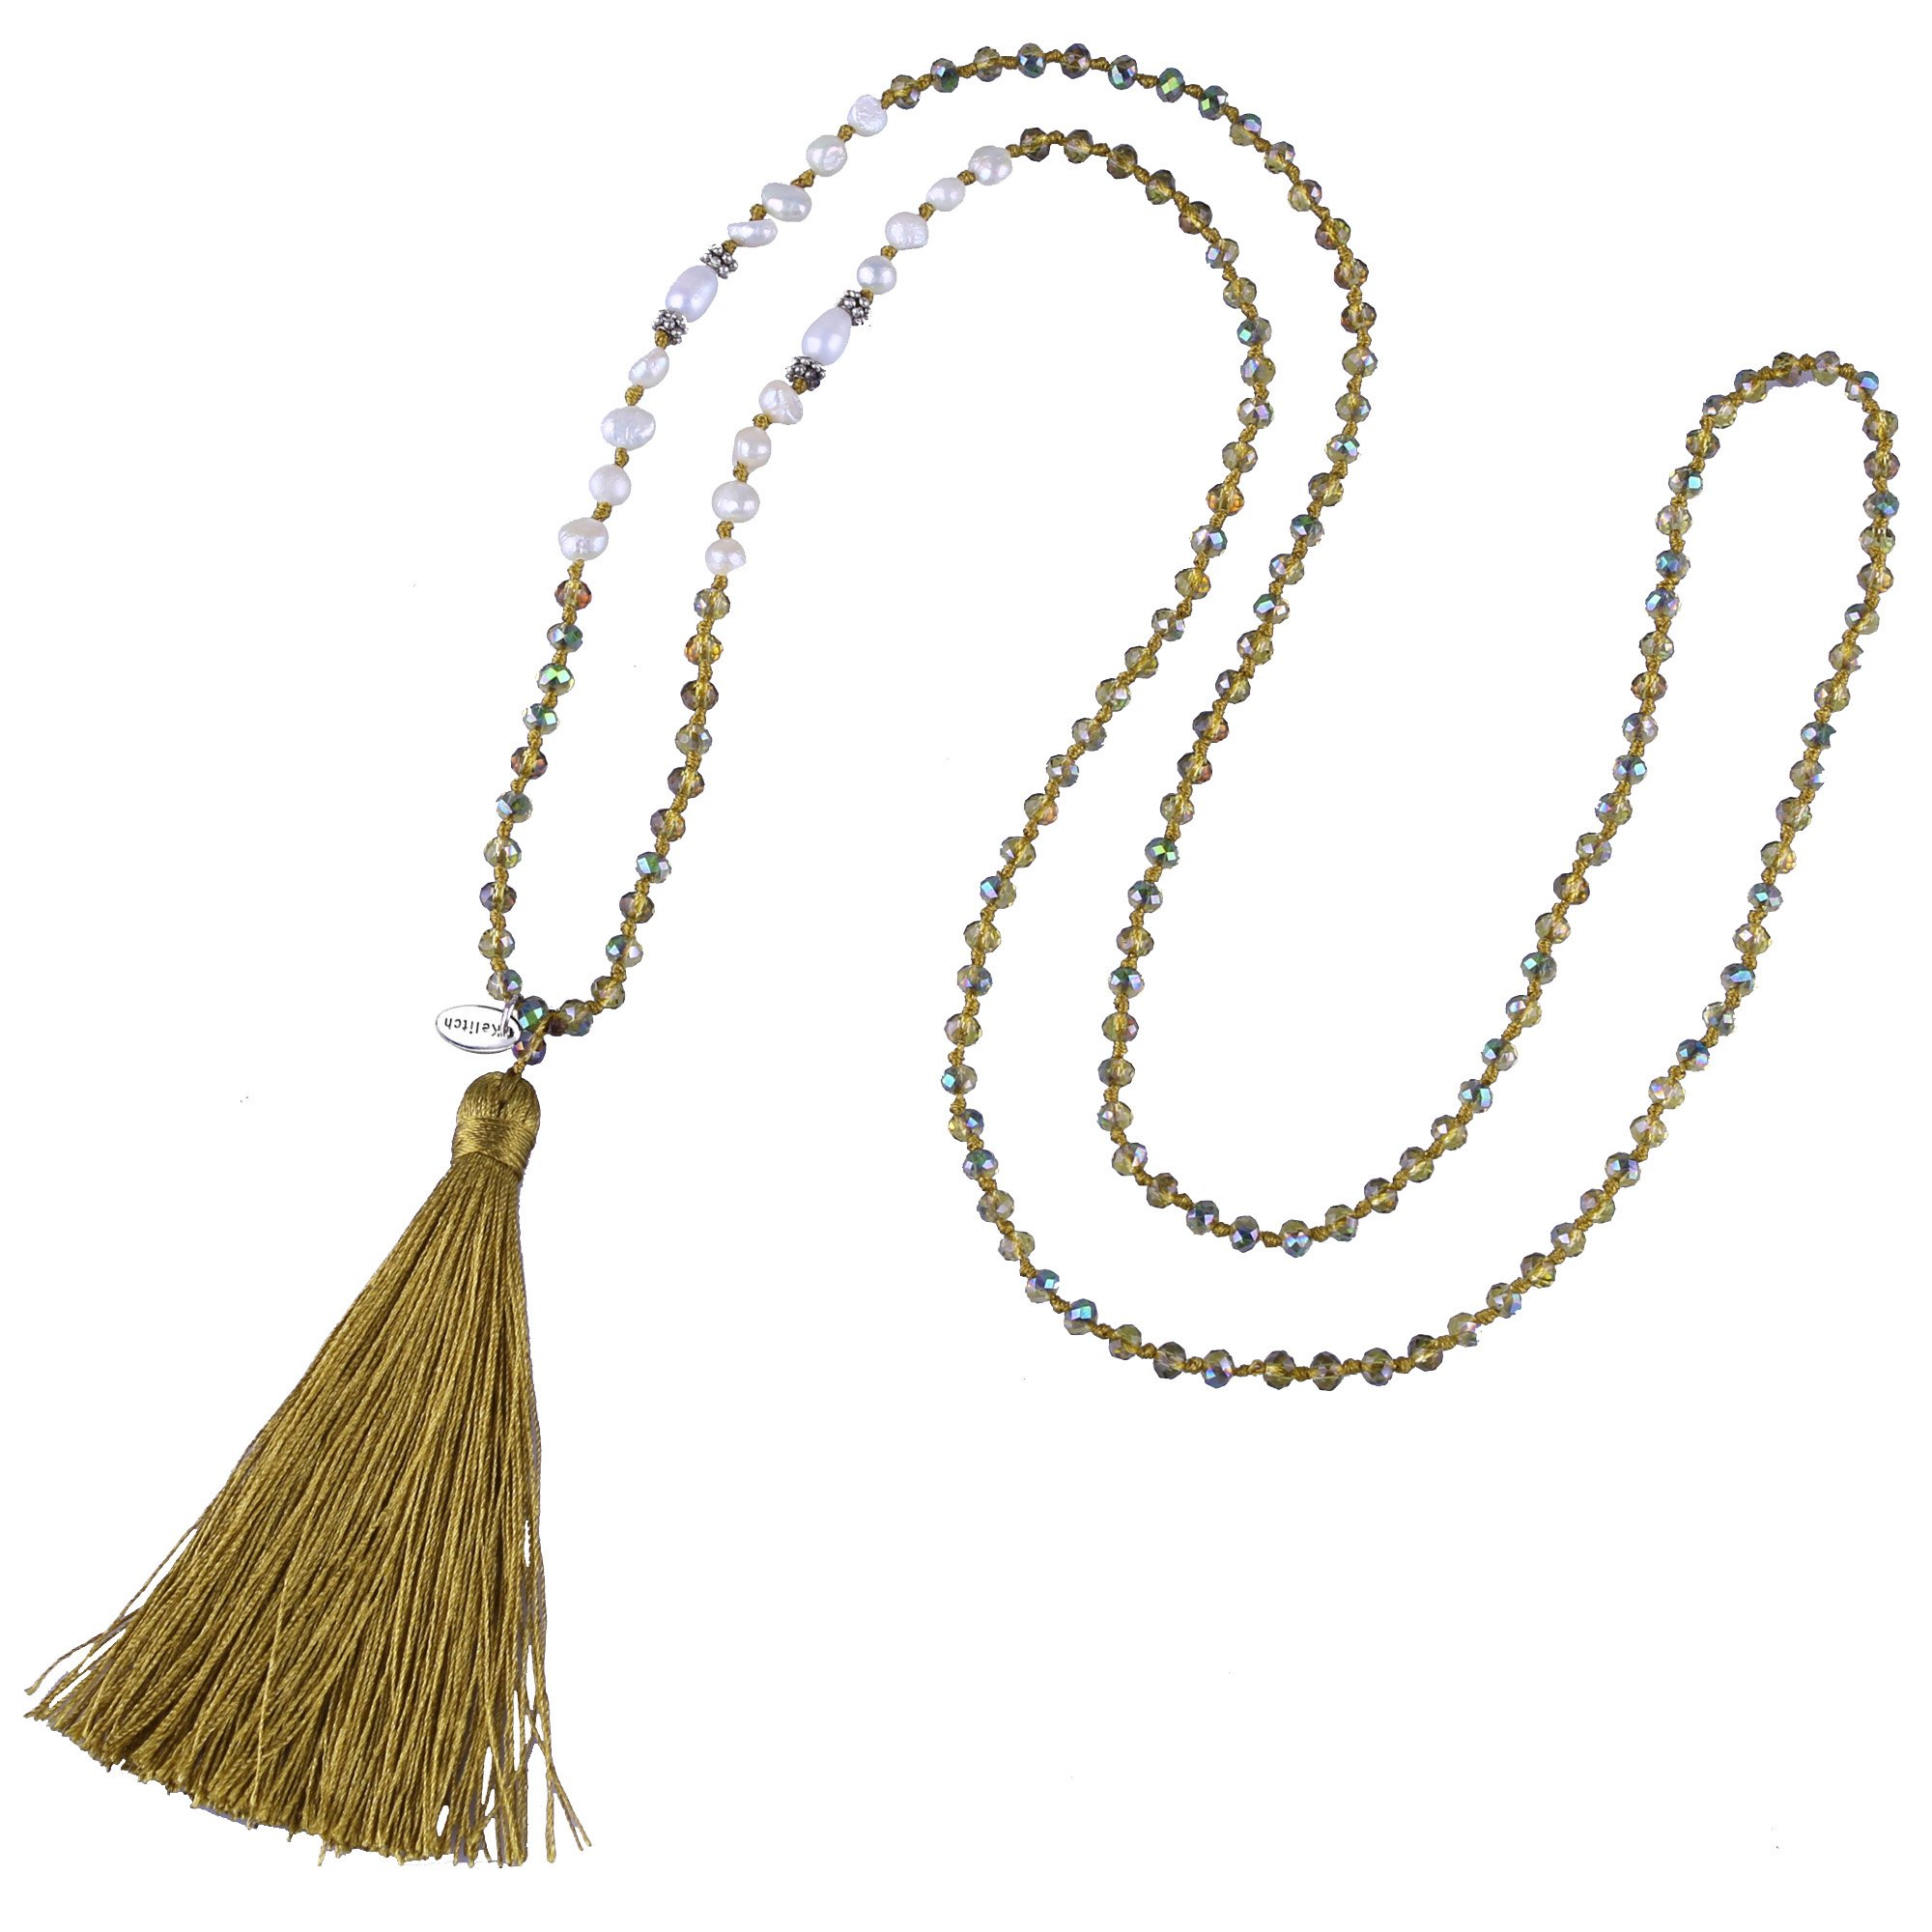 KELITCH Bohemian Tassel Pendant Necklace Shell Pearls Beads Necklace Fashion Jewelry, Yellow